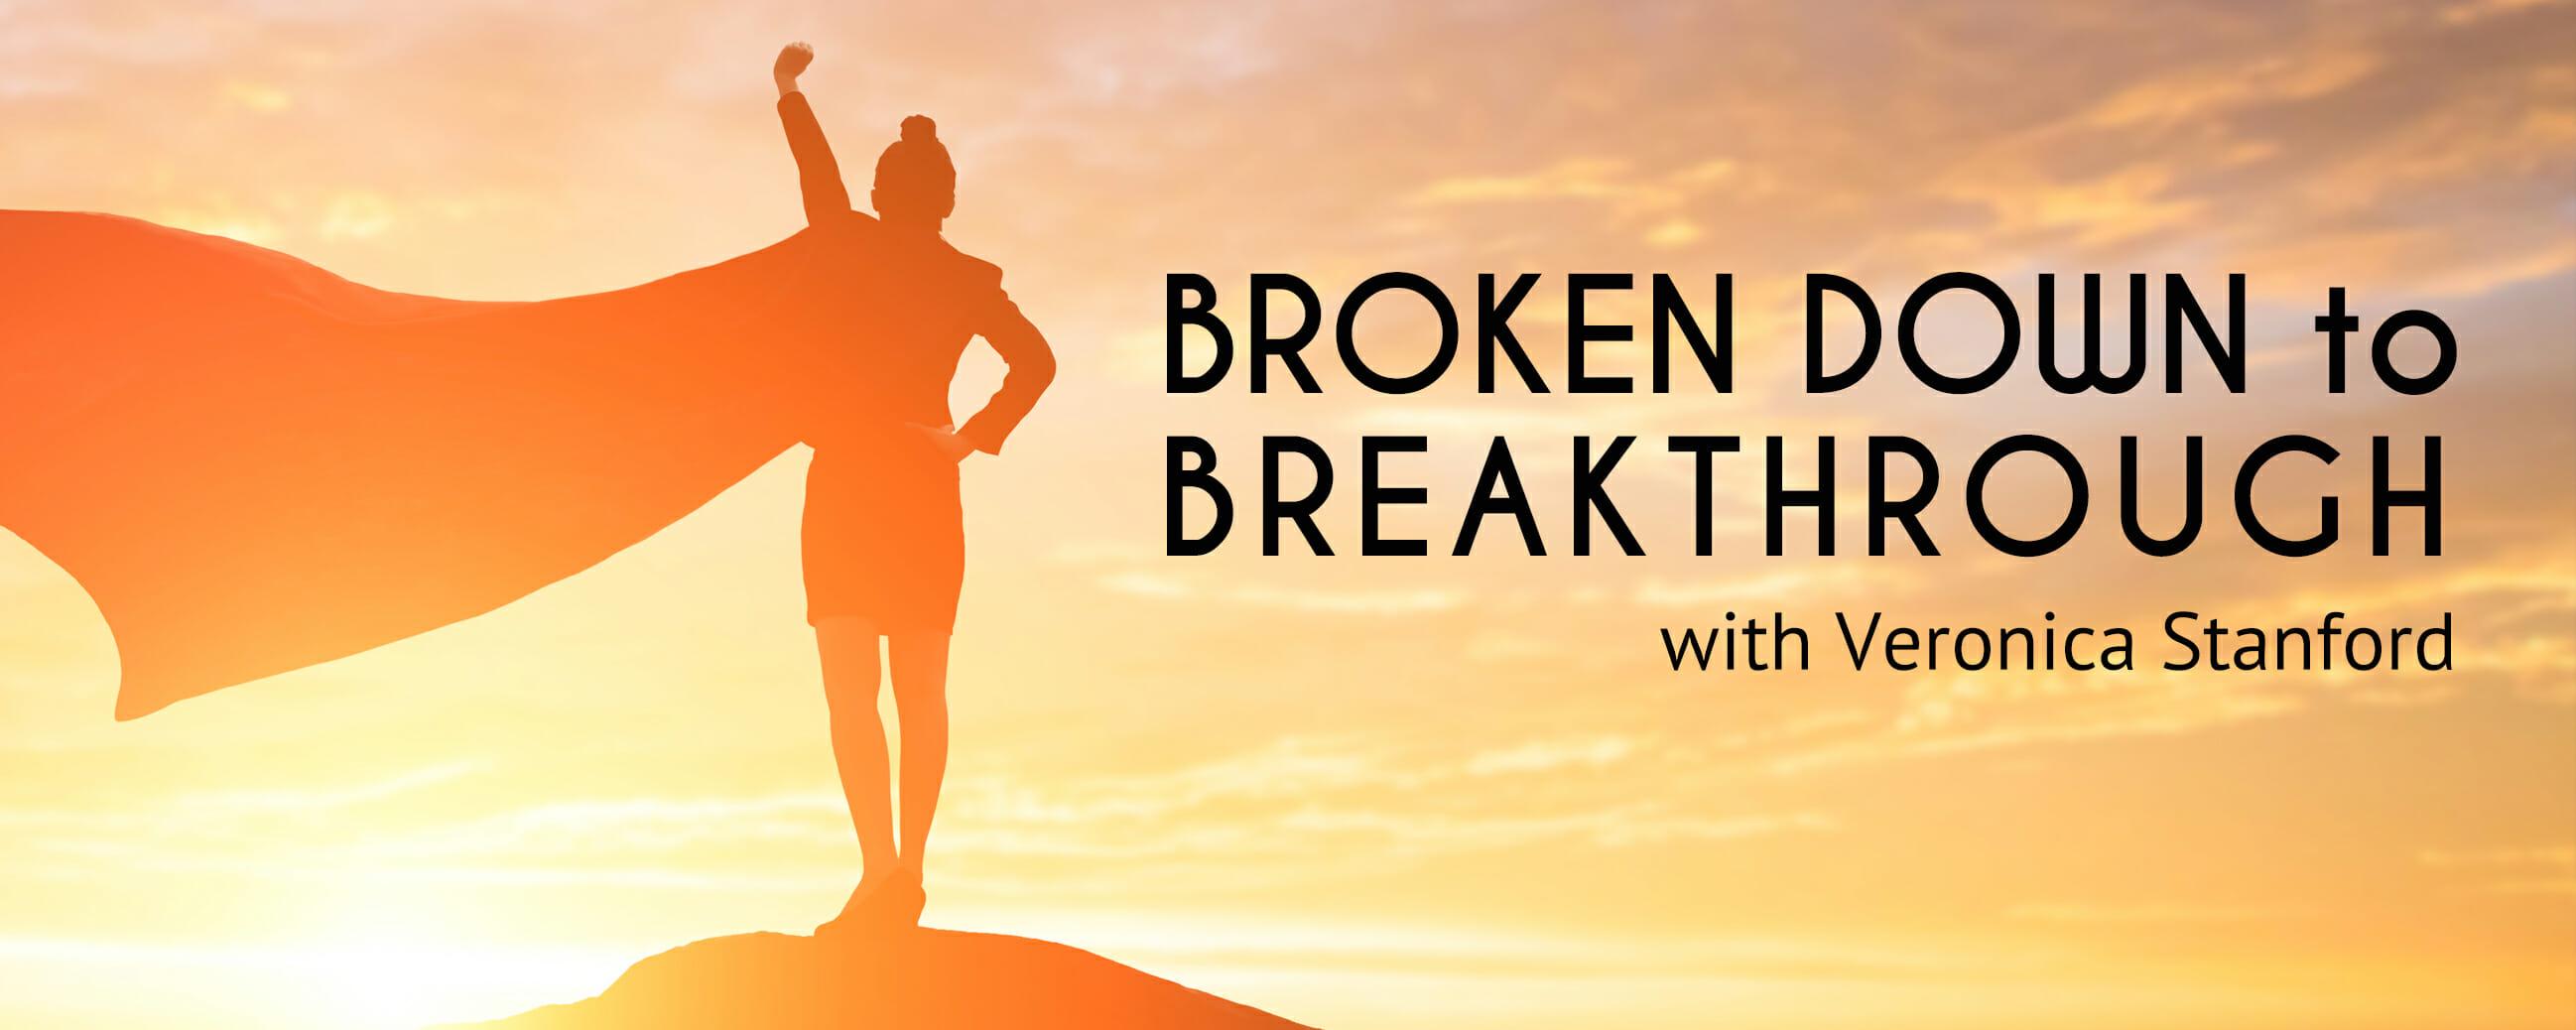 Broken Down to Breakthrough with Veronica Stanford | Web Talk Radio